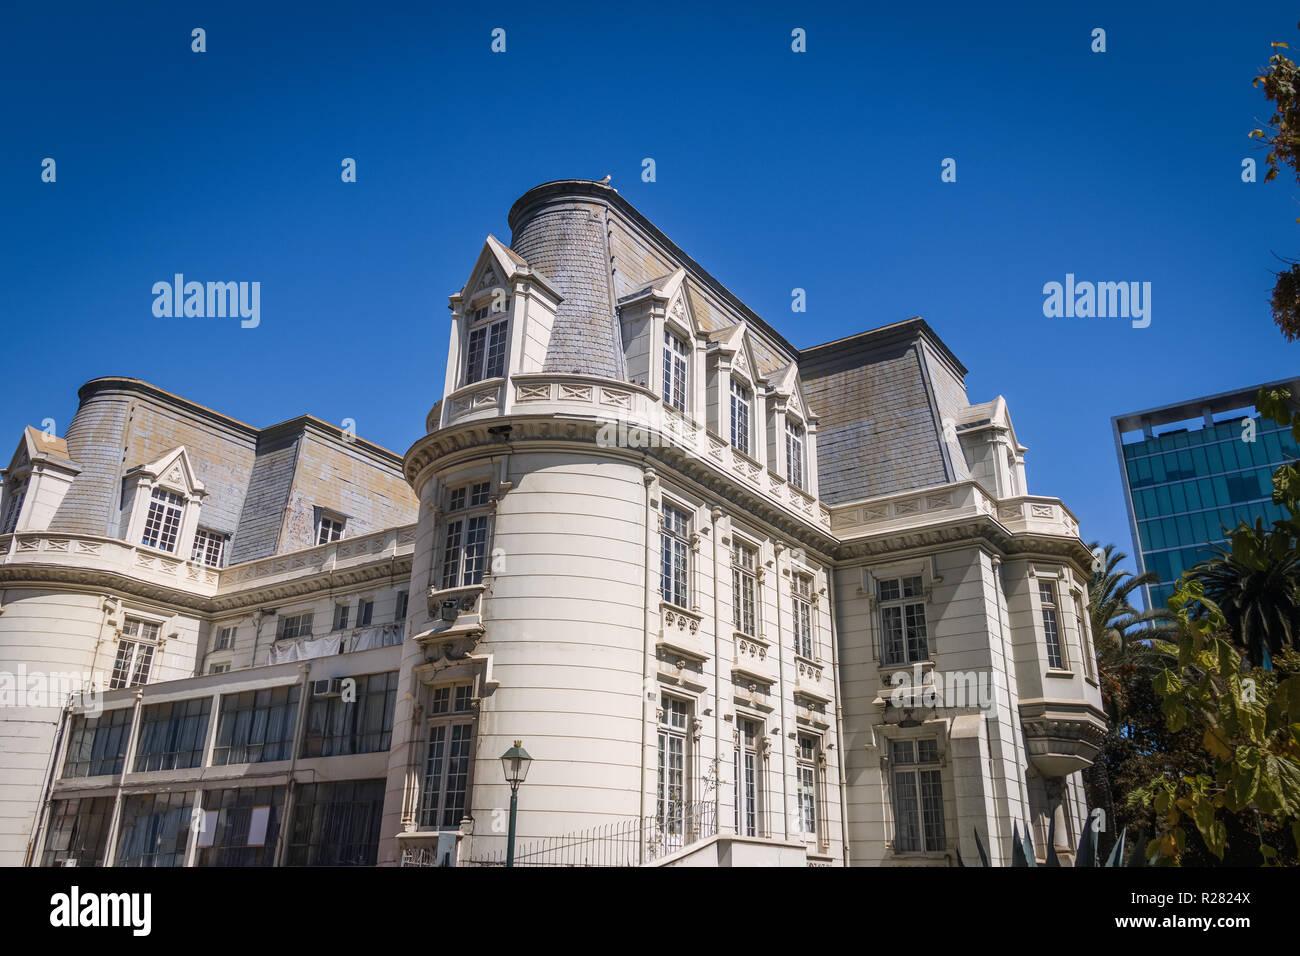 Carrasco Palace - Vina del Mar, Chile - Stock Image